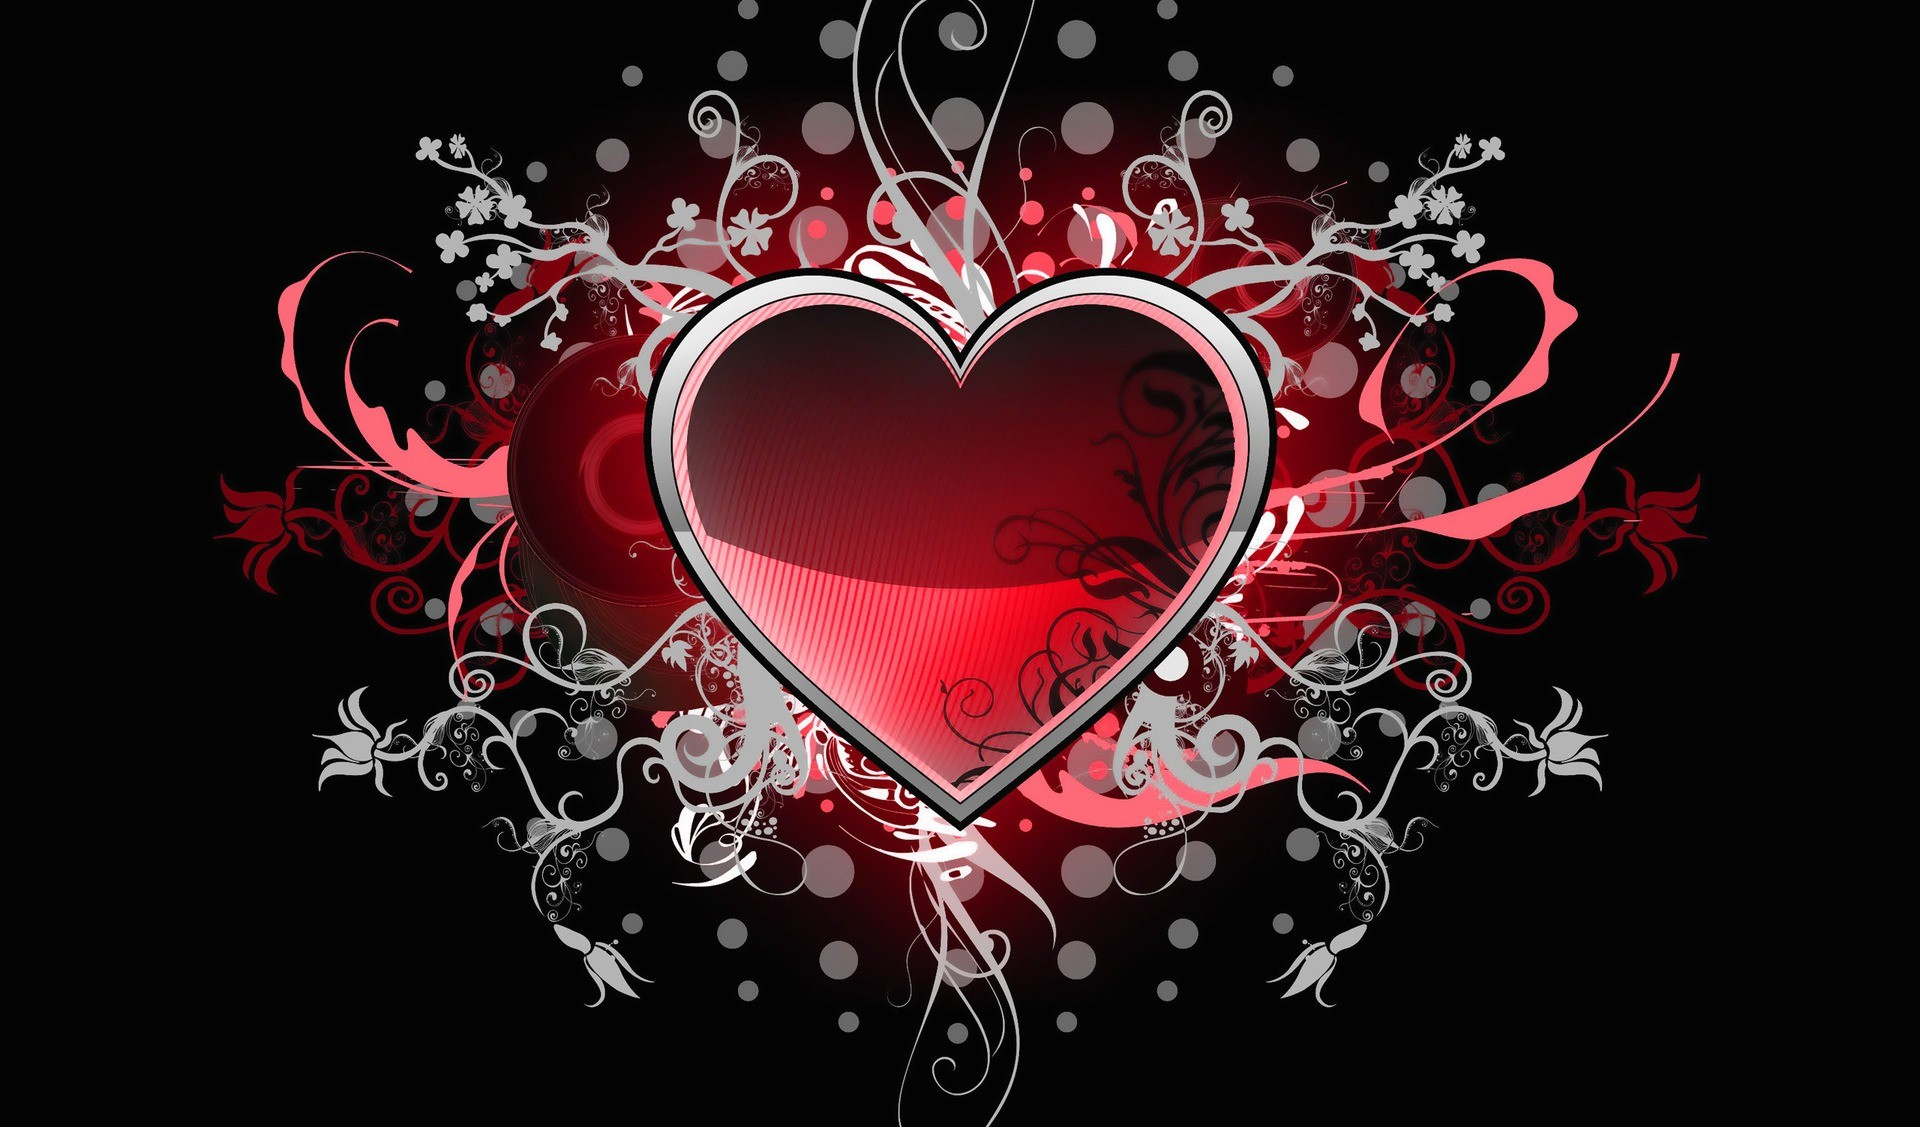 HEART ORIGINATES BRANCHES